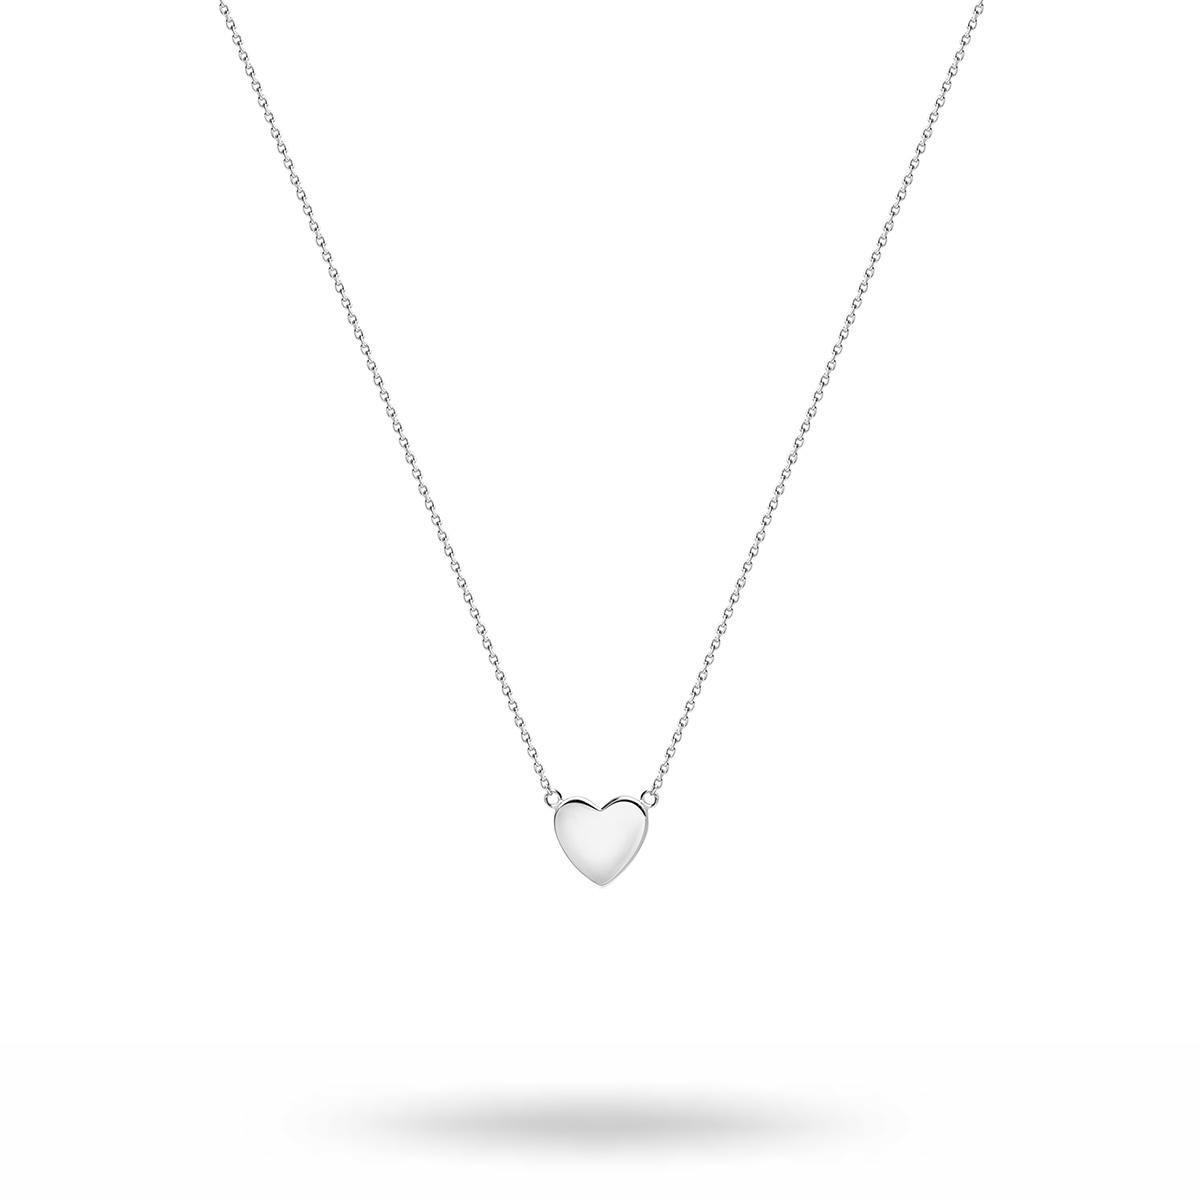 Mini-heart-necklace-Rhodium-plated-silver